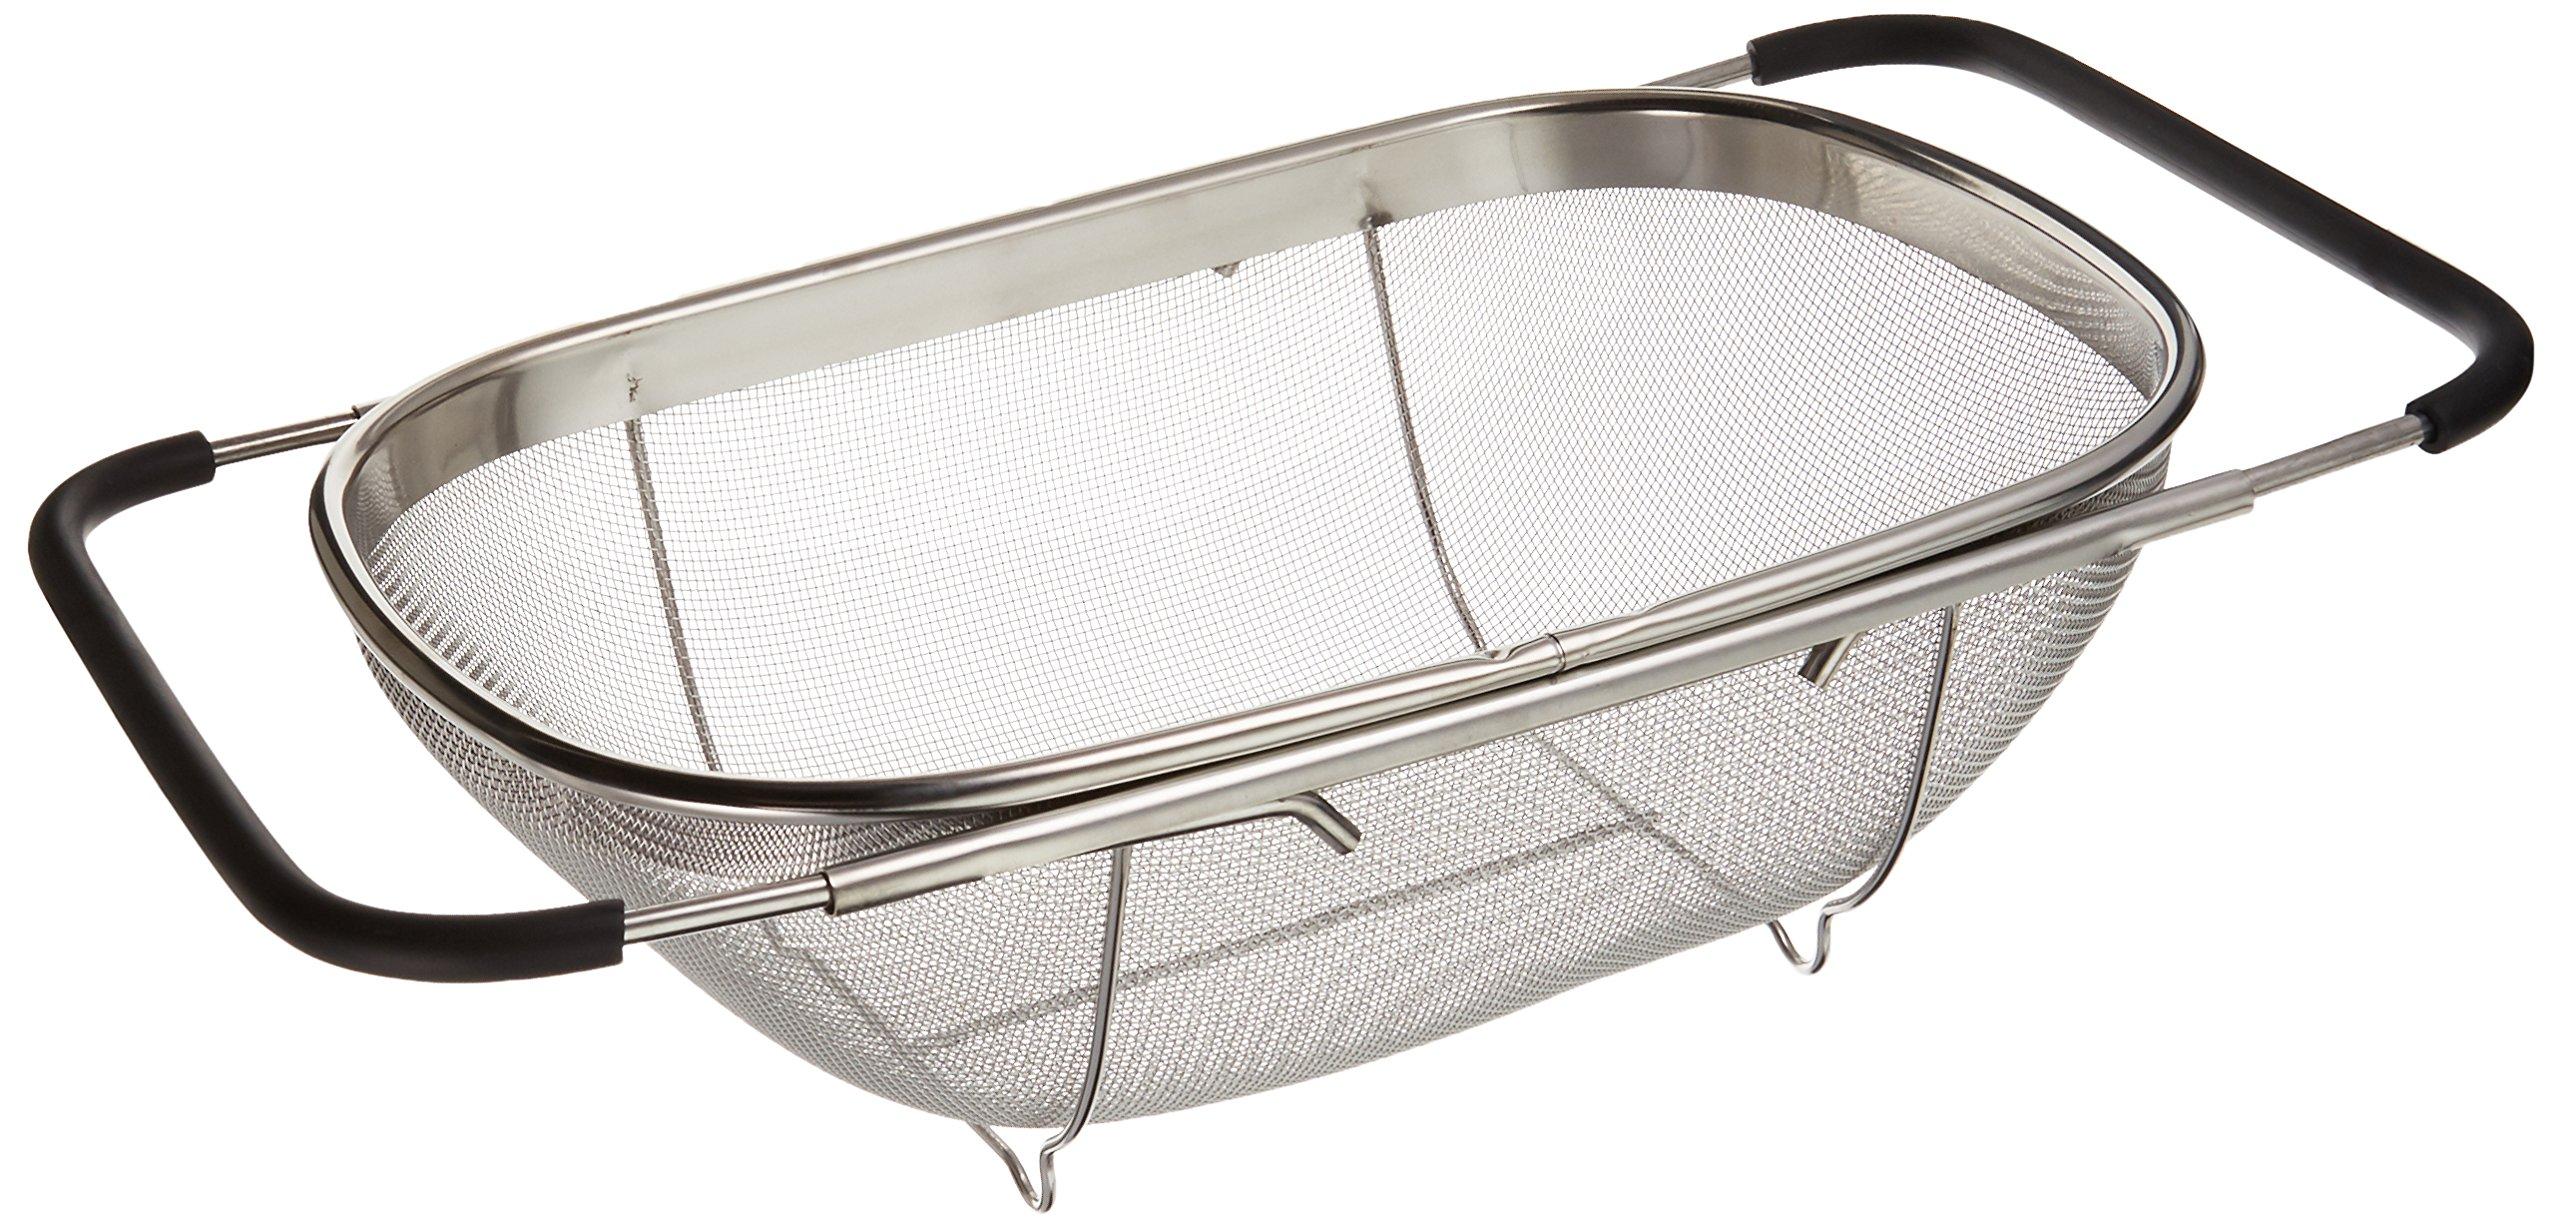 Over Sink Stainless Steel Adjustable Colander Strainer by Uniware